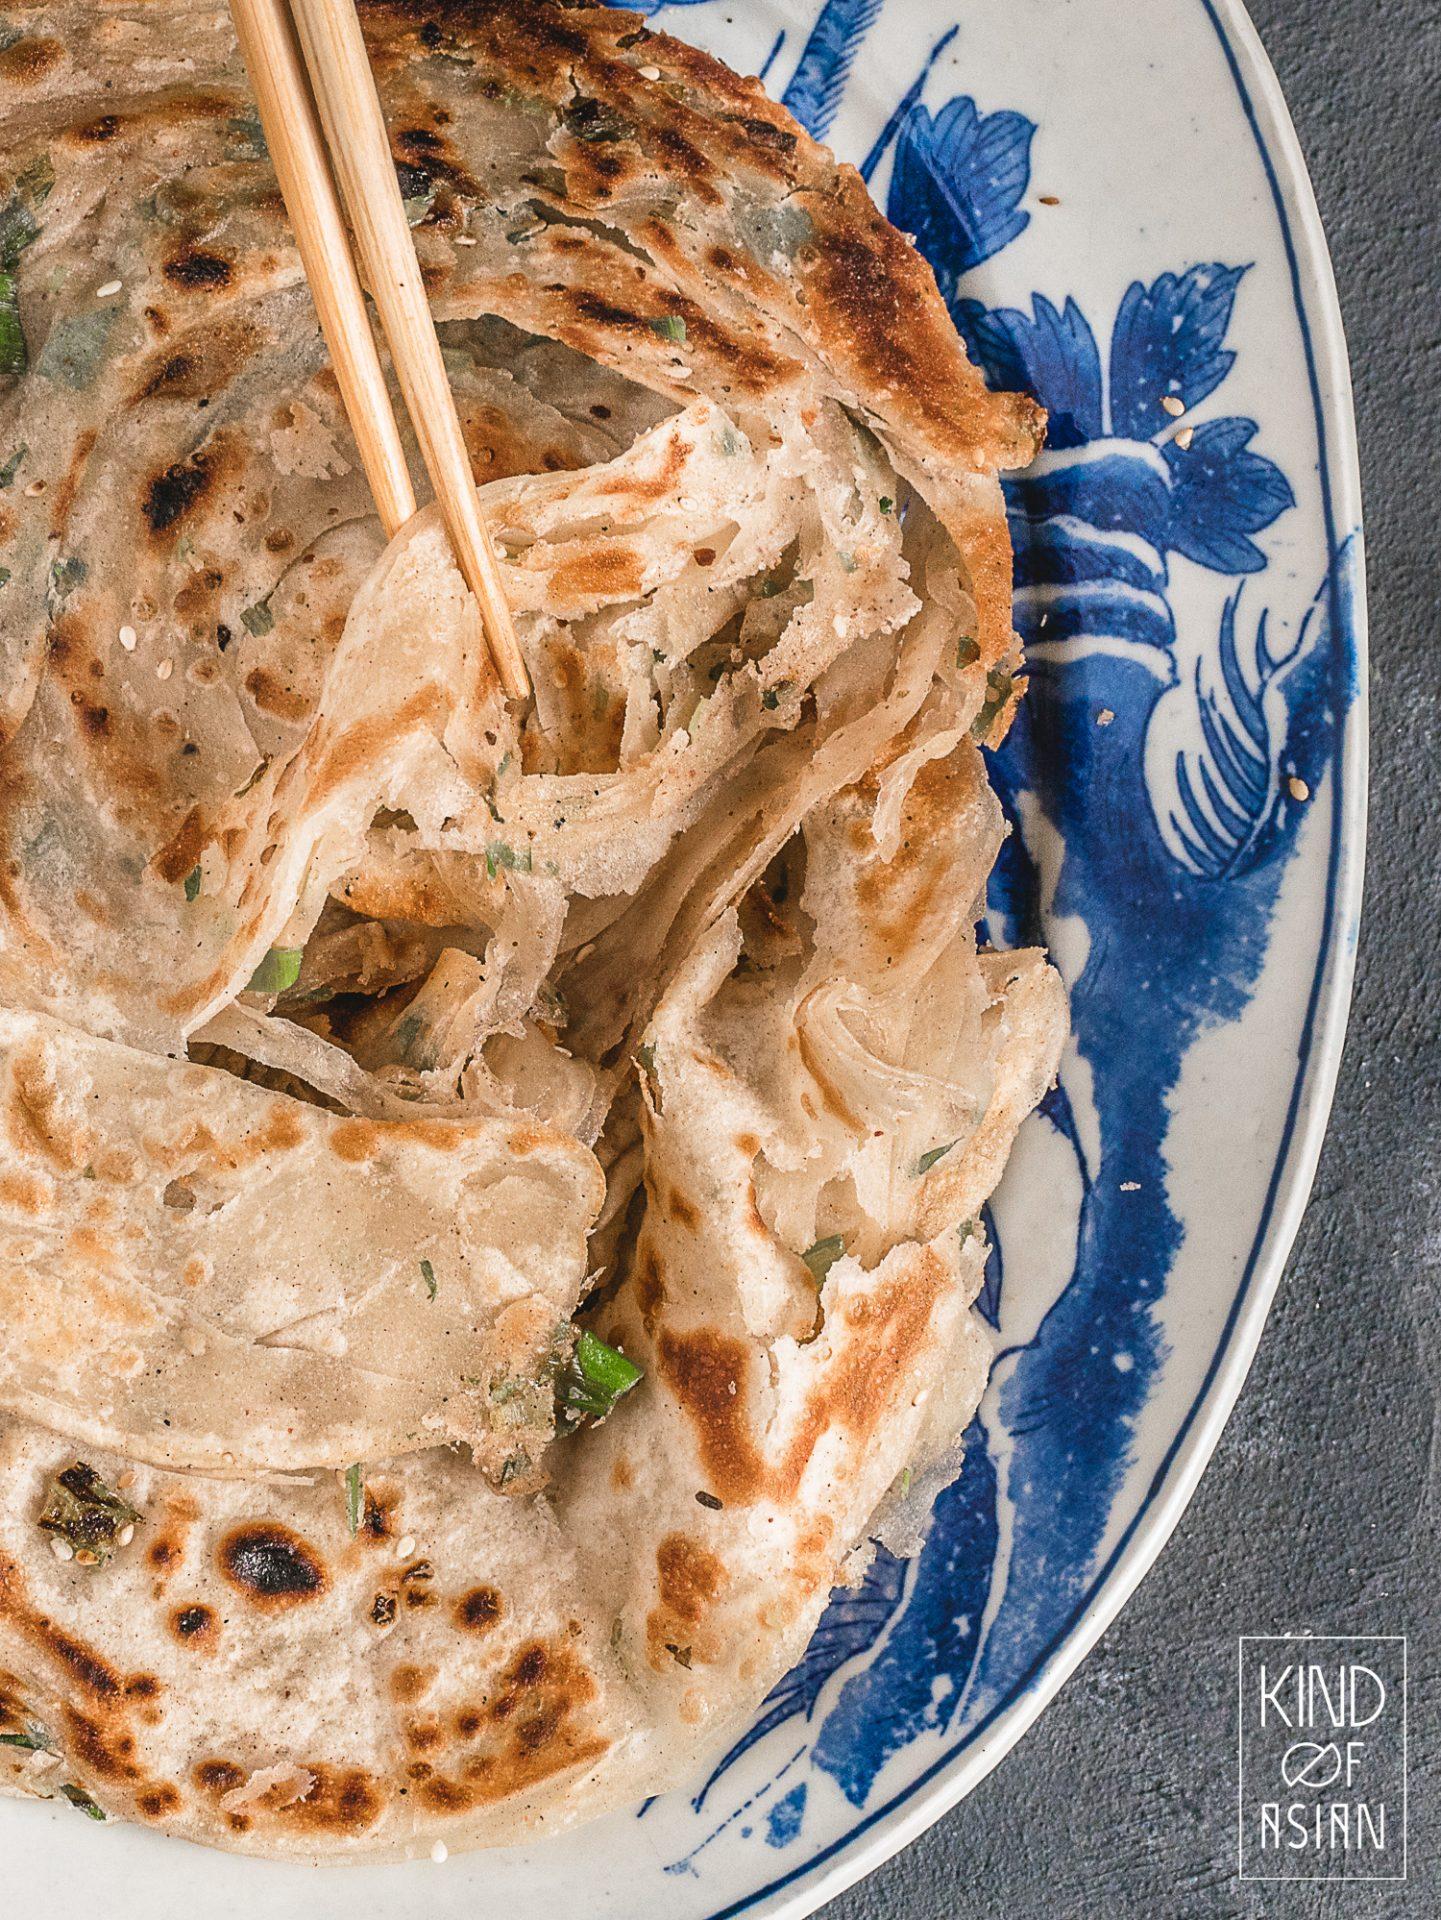 Deze Chinese flatbread (zonder gist) bestaat uit dunne laagjes zacht en chewy deeg en smaakvolle lente-ui, sesam en 5-spice.